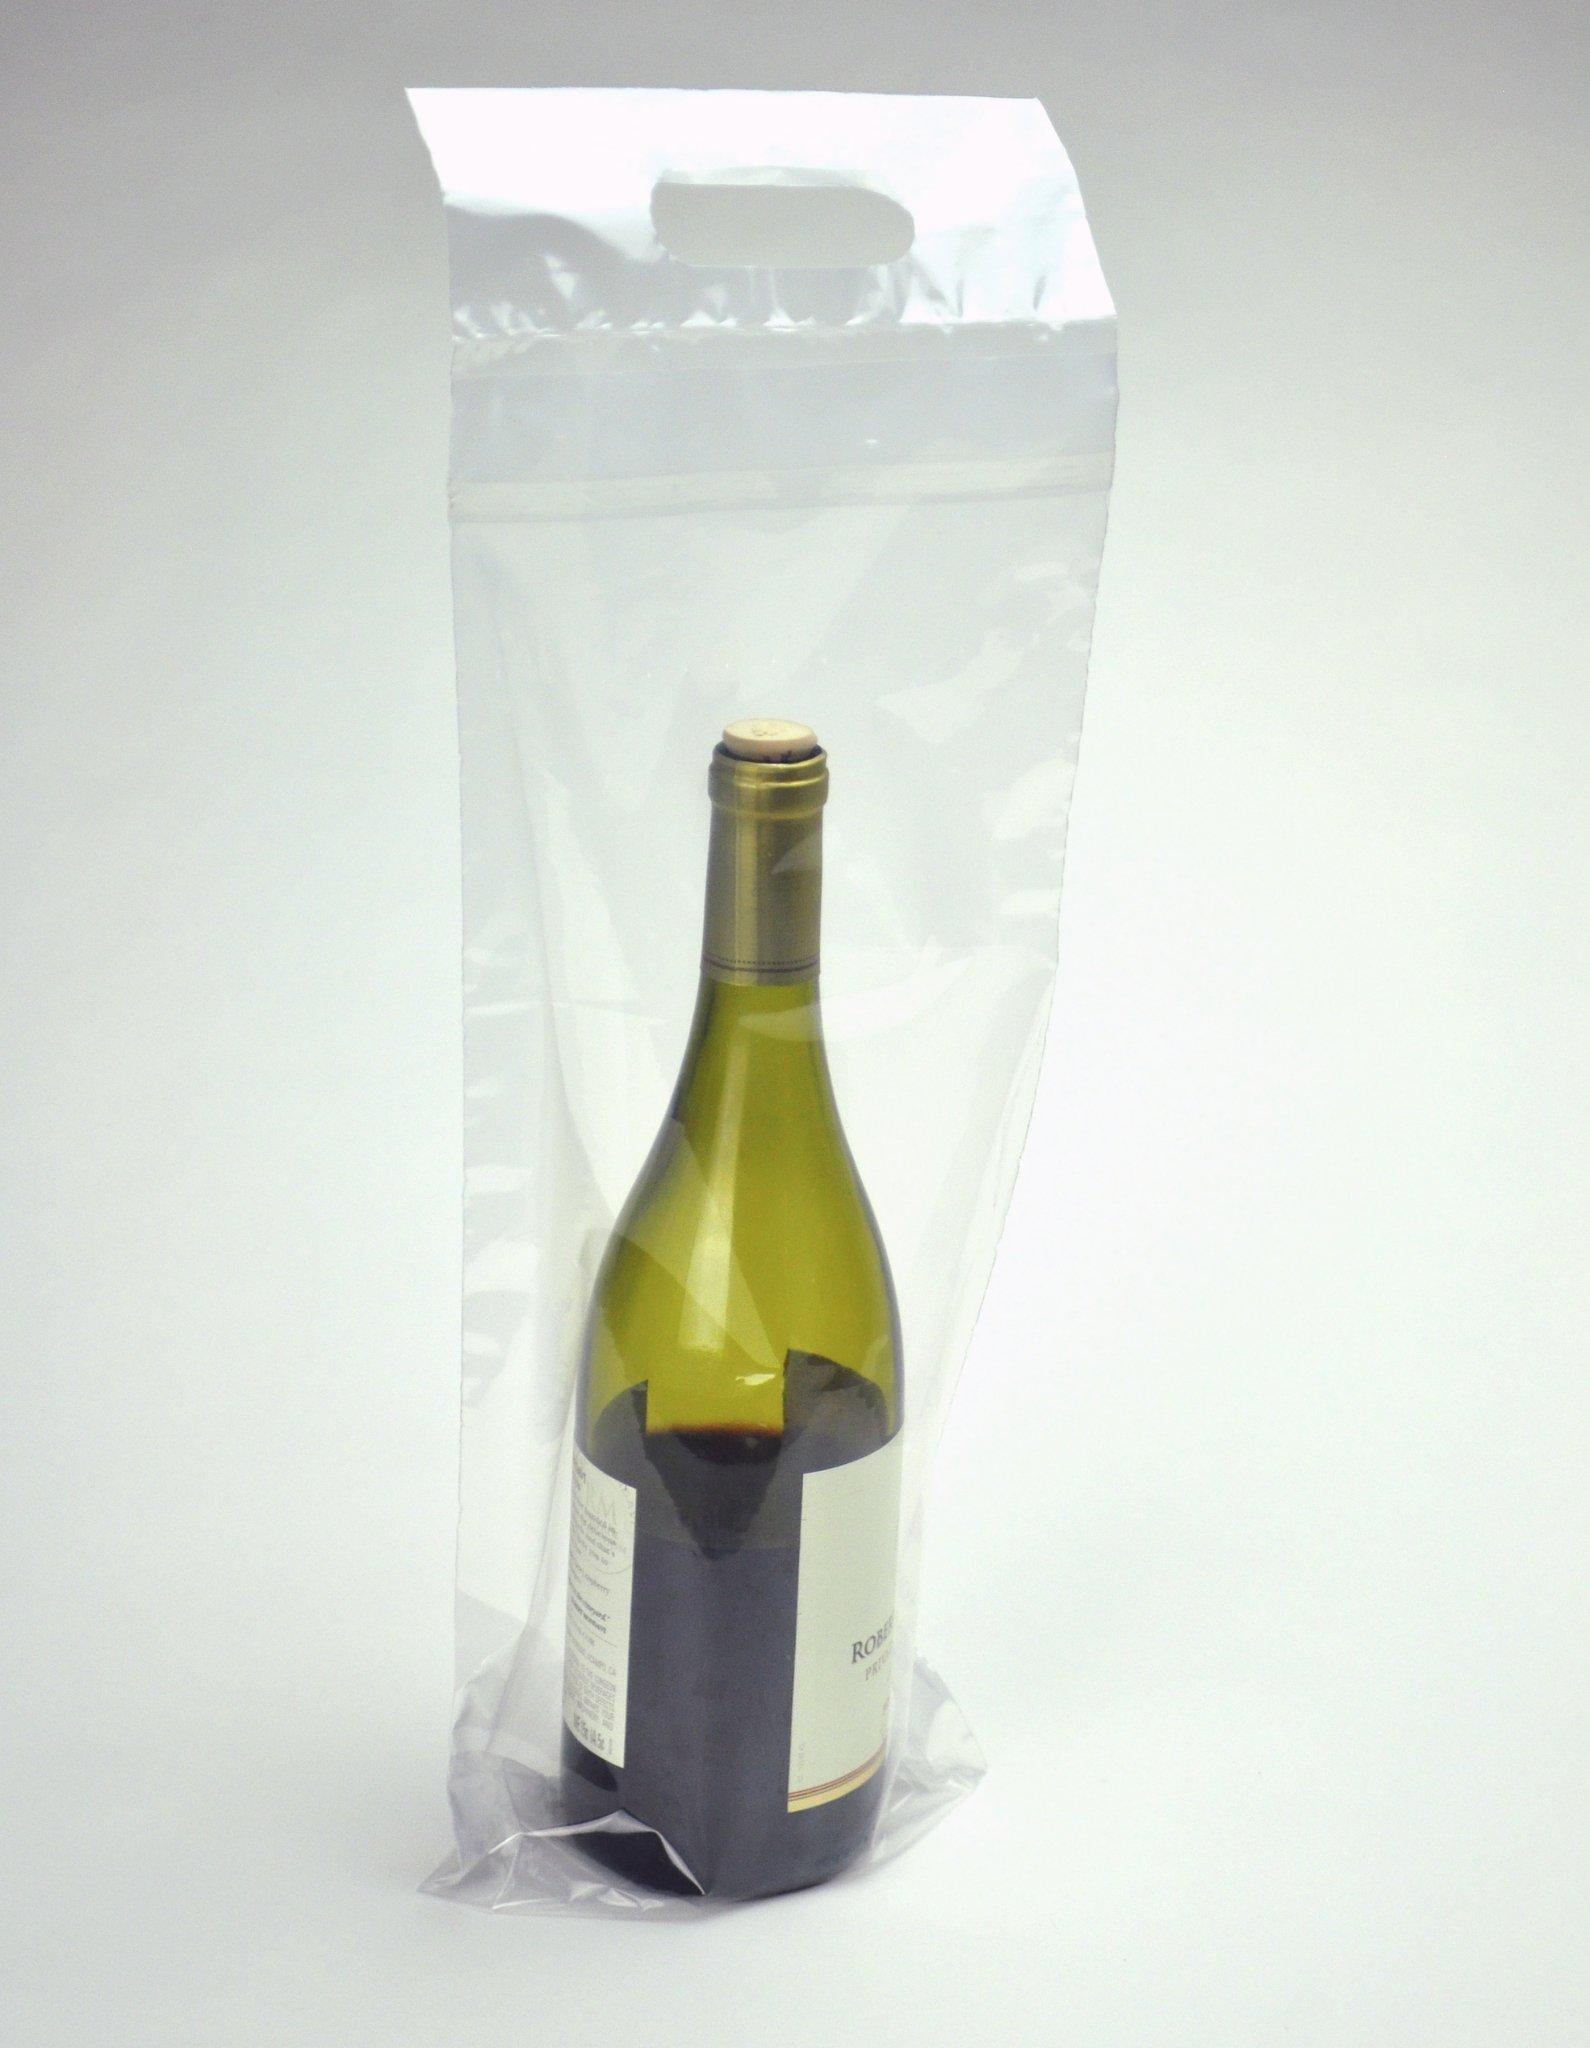 7 X 19 + 3-1/2 BG + 1-1/4 FB Wine To-Go Bag (250 Bags) - Elkay Plastics WBPL719+3 by Elkay Plastics (Image #1)